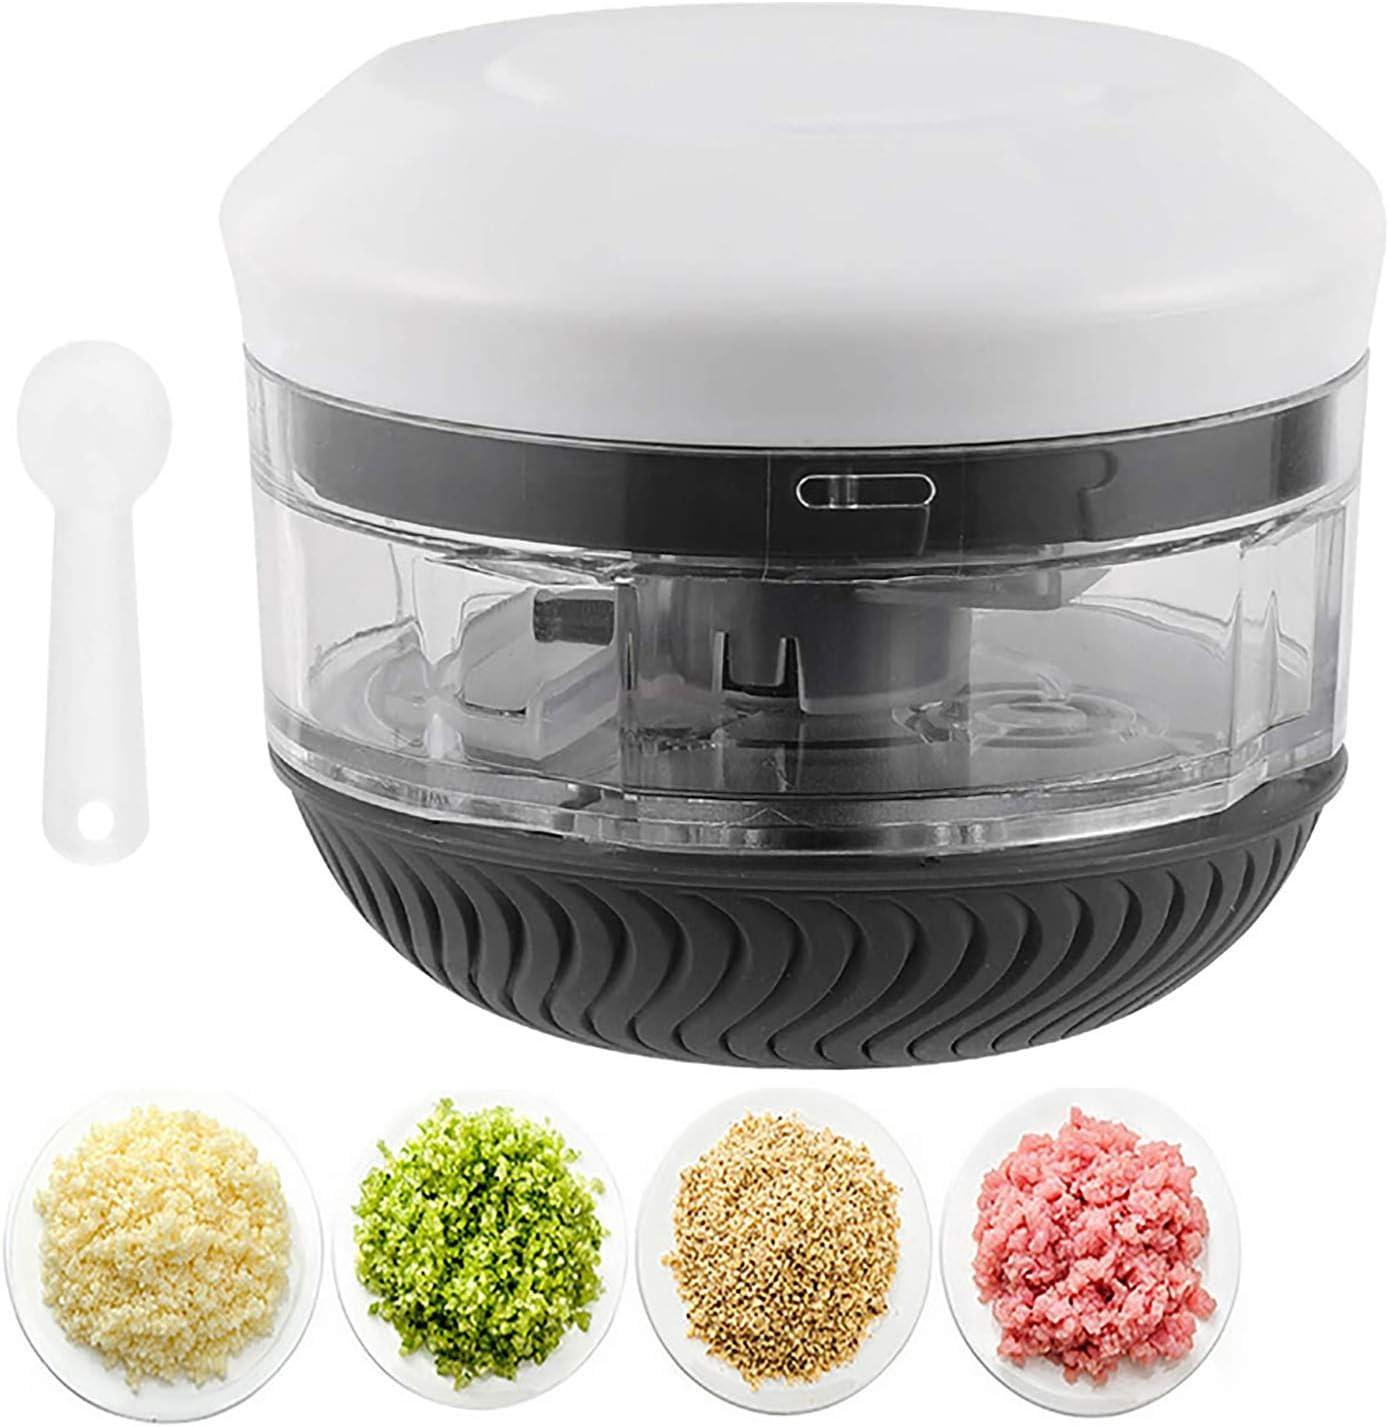 Mini Food Chopper, Portable Garlic Blender Mincer Onion Chopper Manual Food Processor, Durable Food Choppers and Dicers, 230ml, BLACK